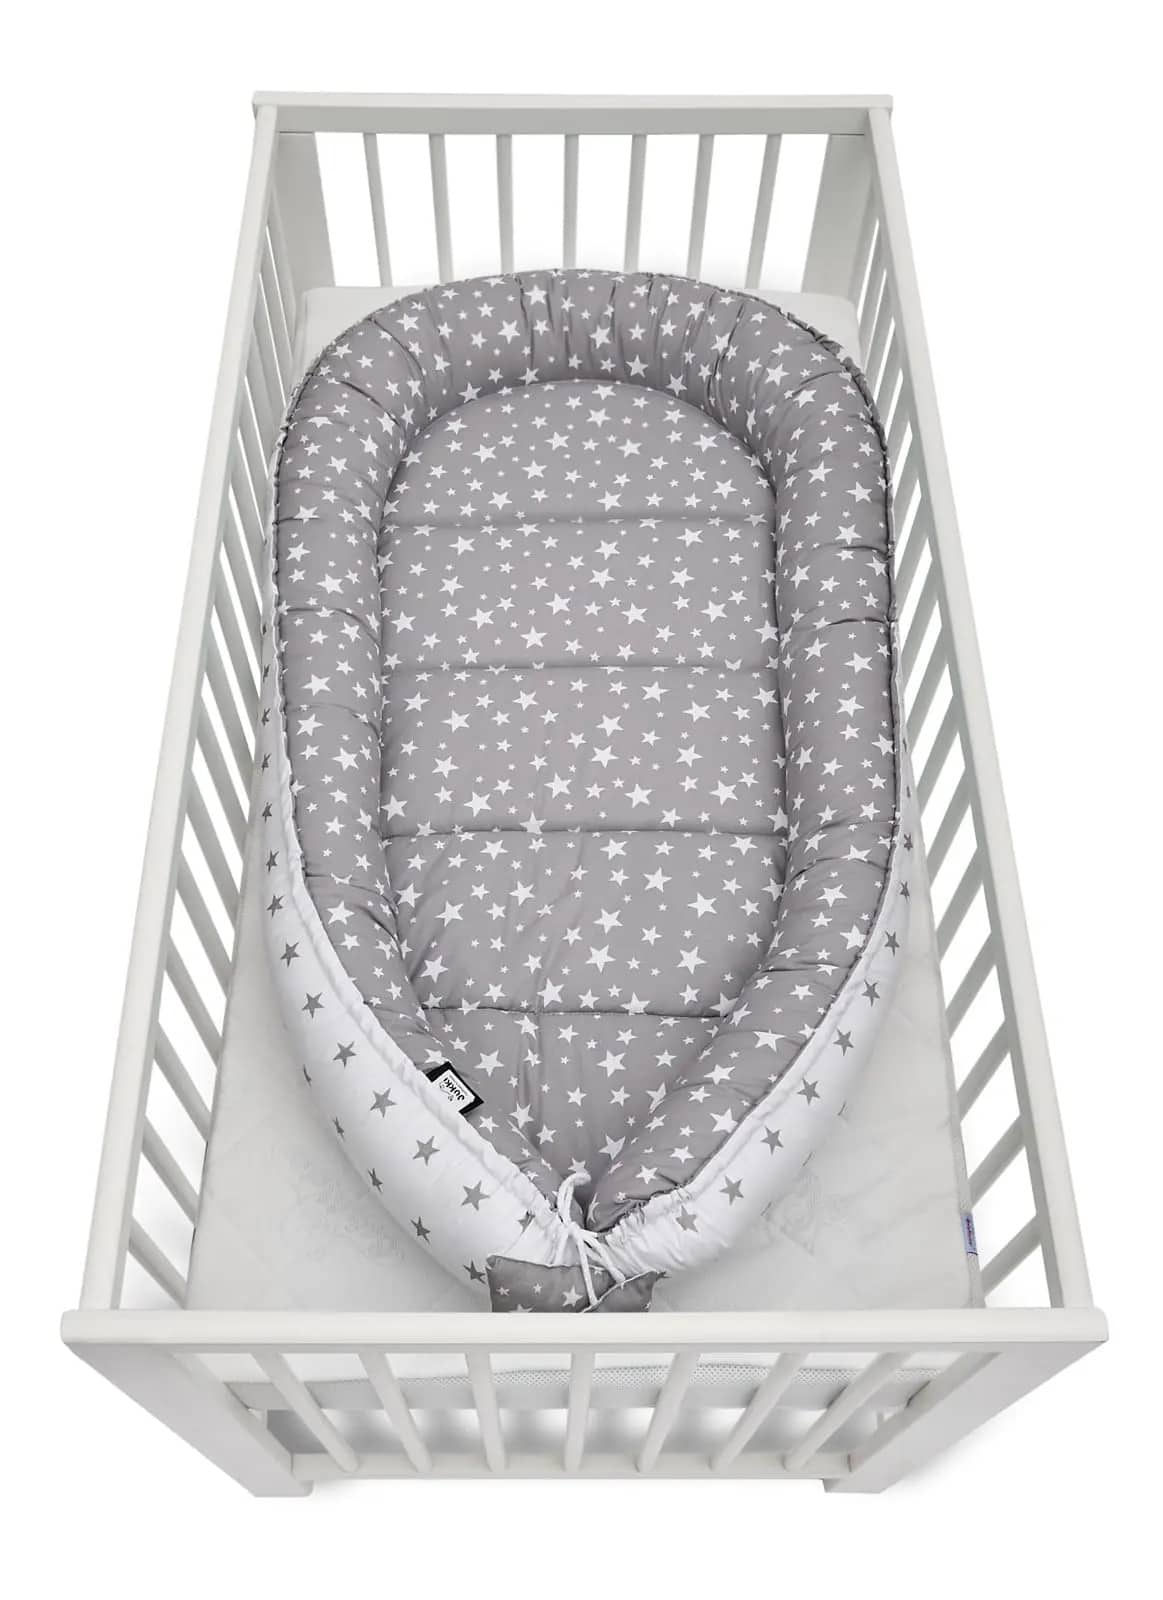 Elegant grey stars baby nest cocoon inside the crib.